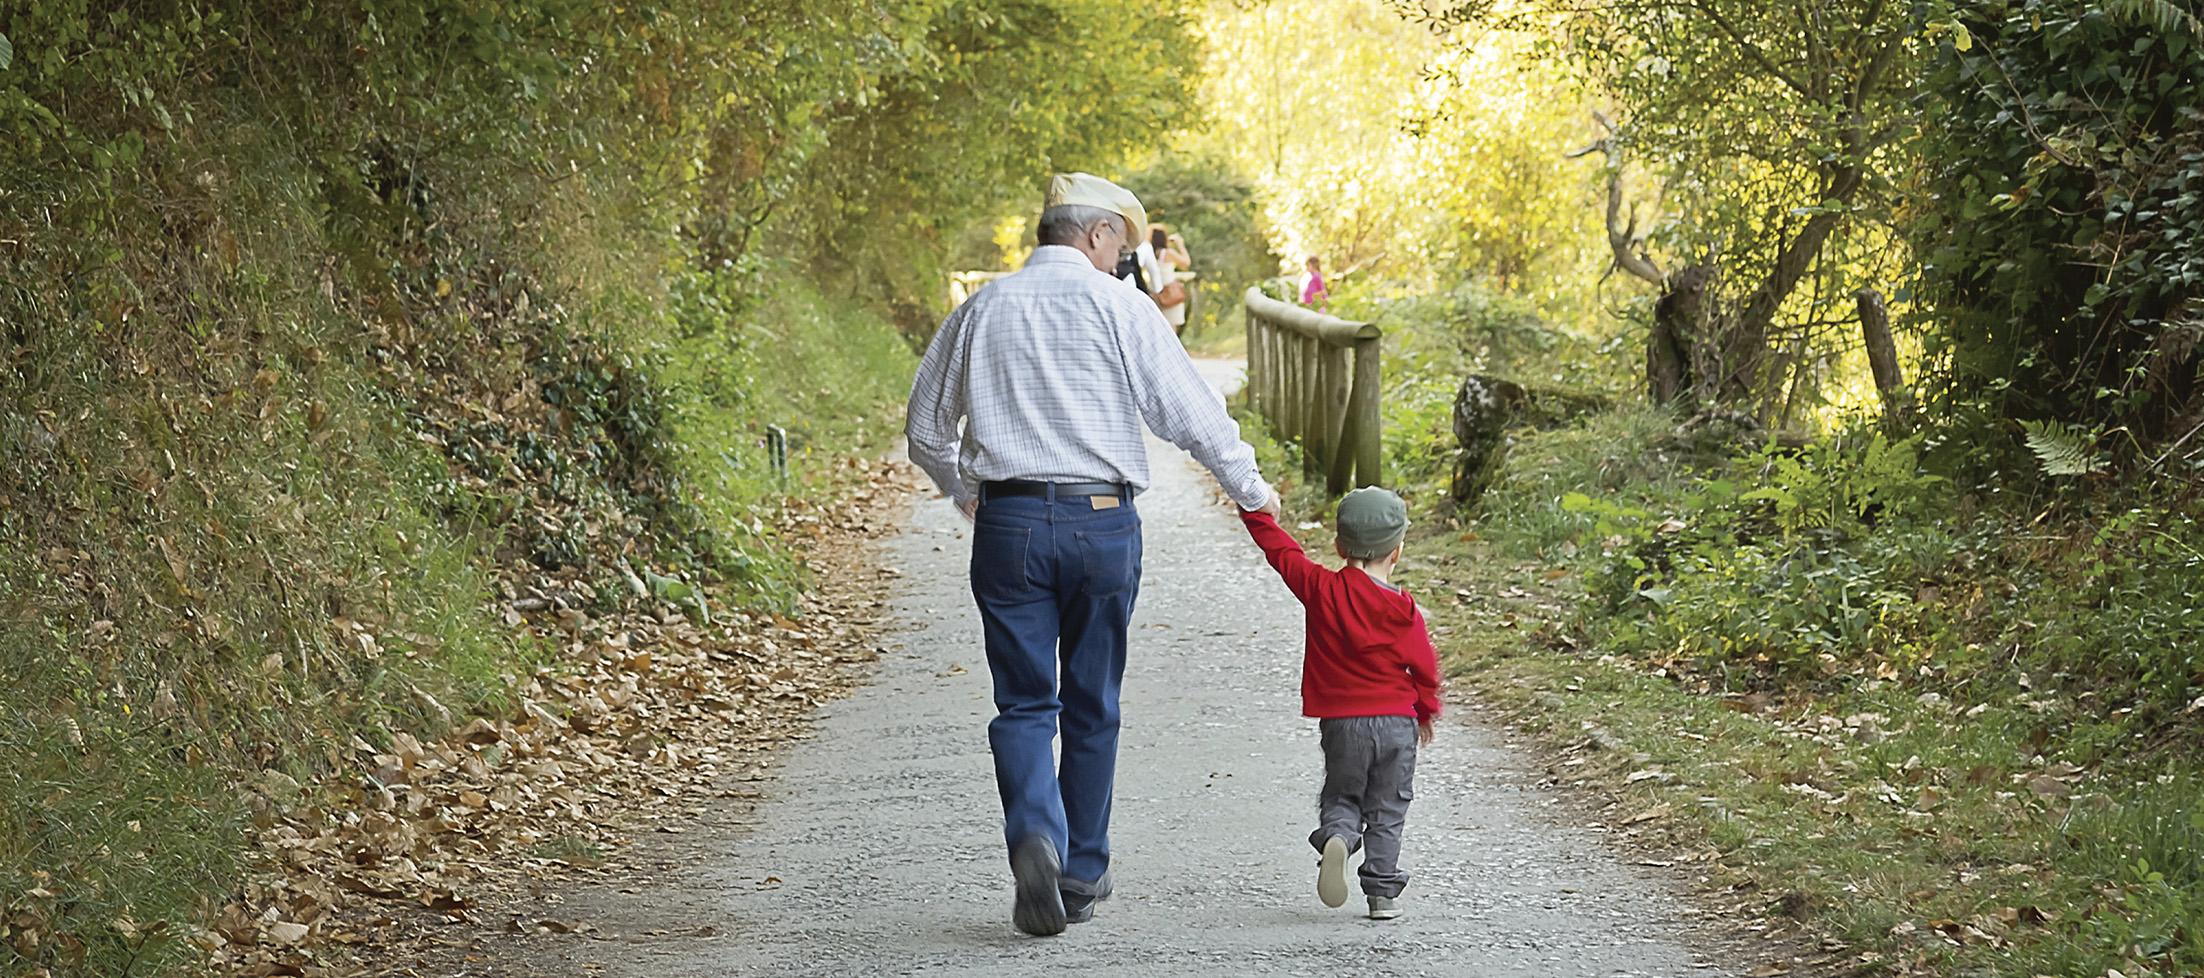 grandpa holds grandson's hand on a walk